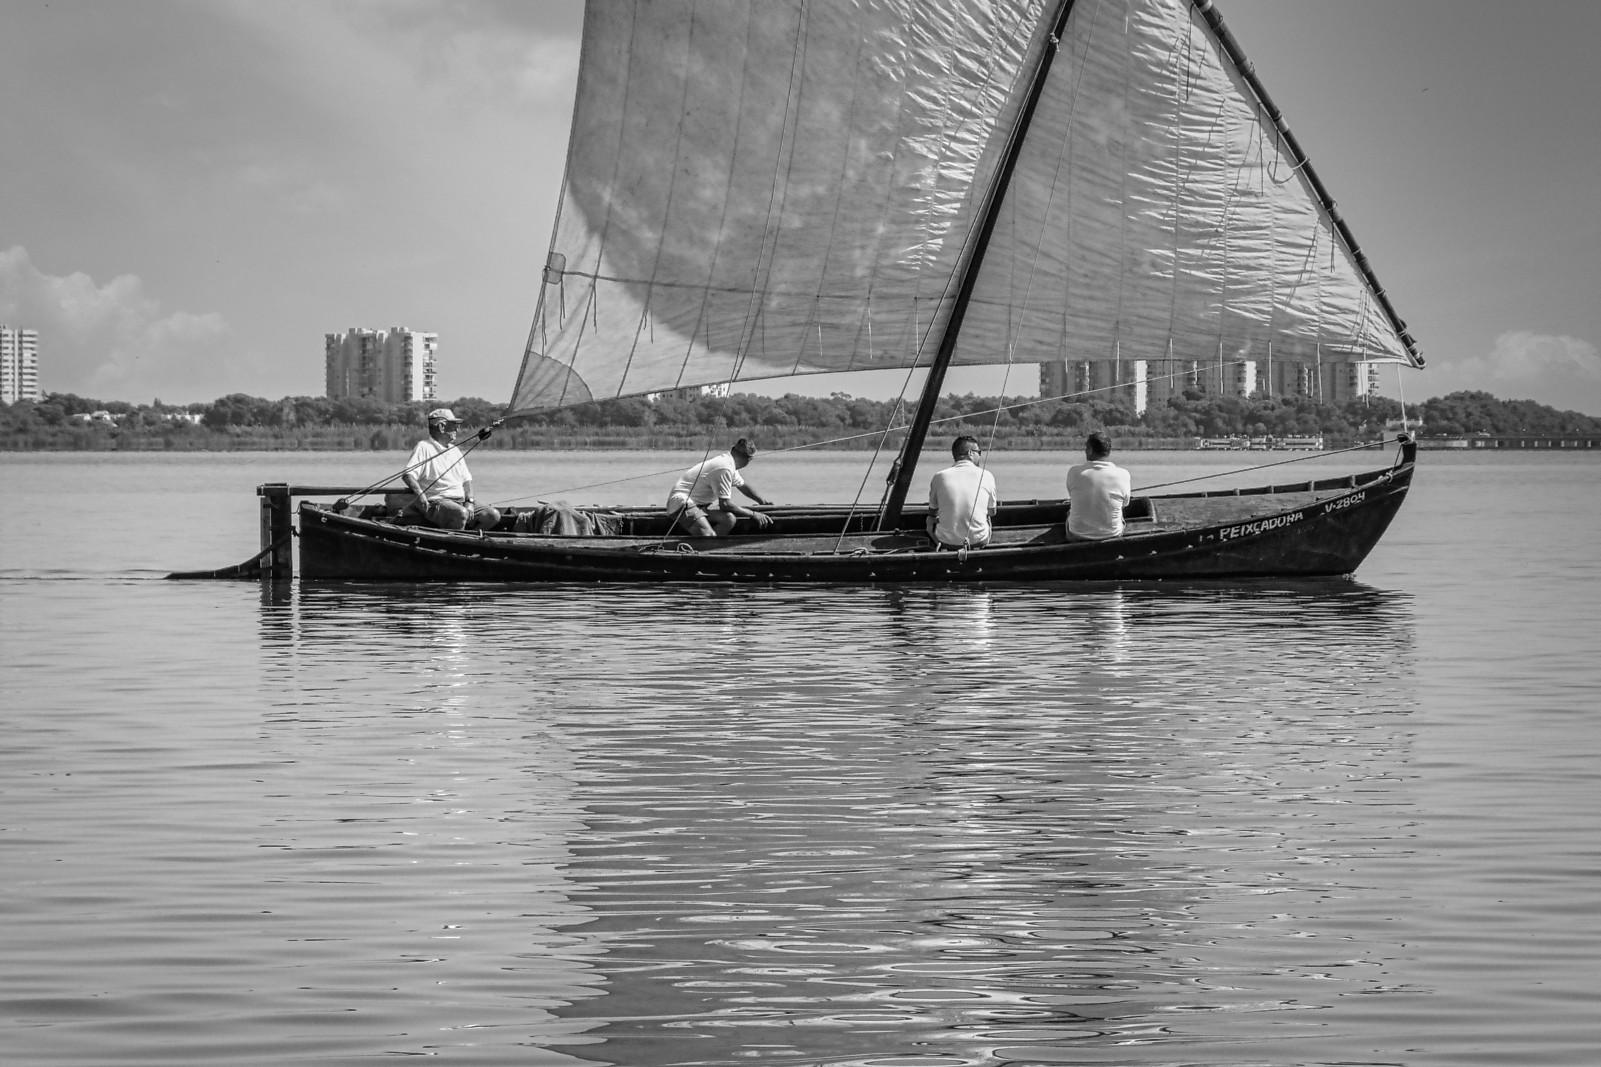 barca_ lapeixcadora_catarroja17092017-P1810406 lola_ruiz